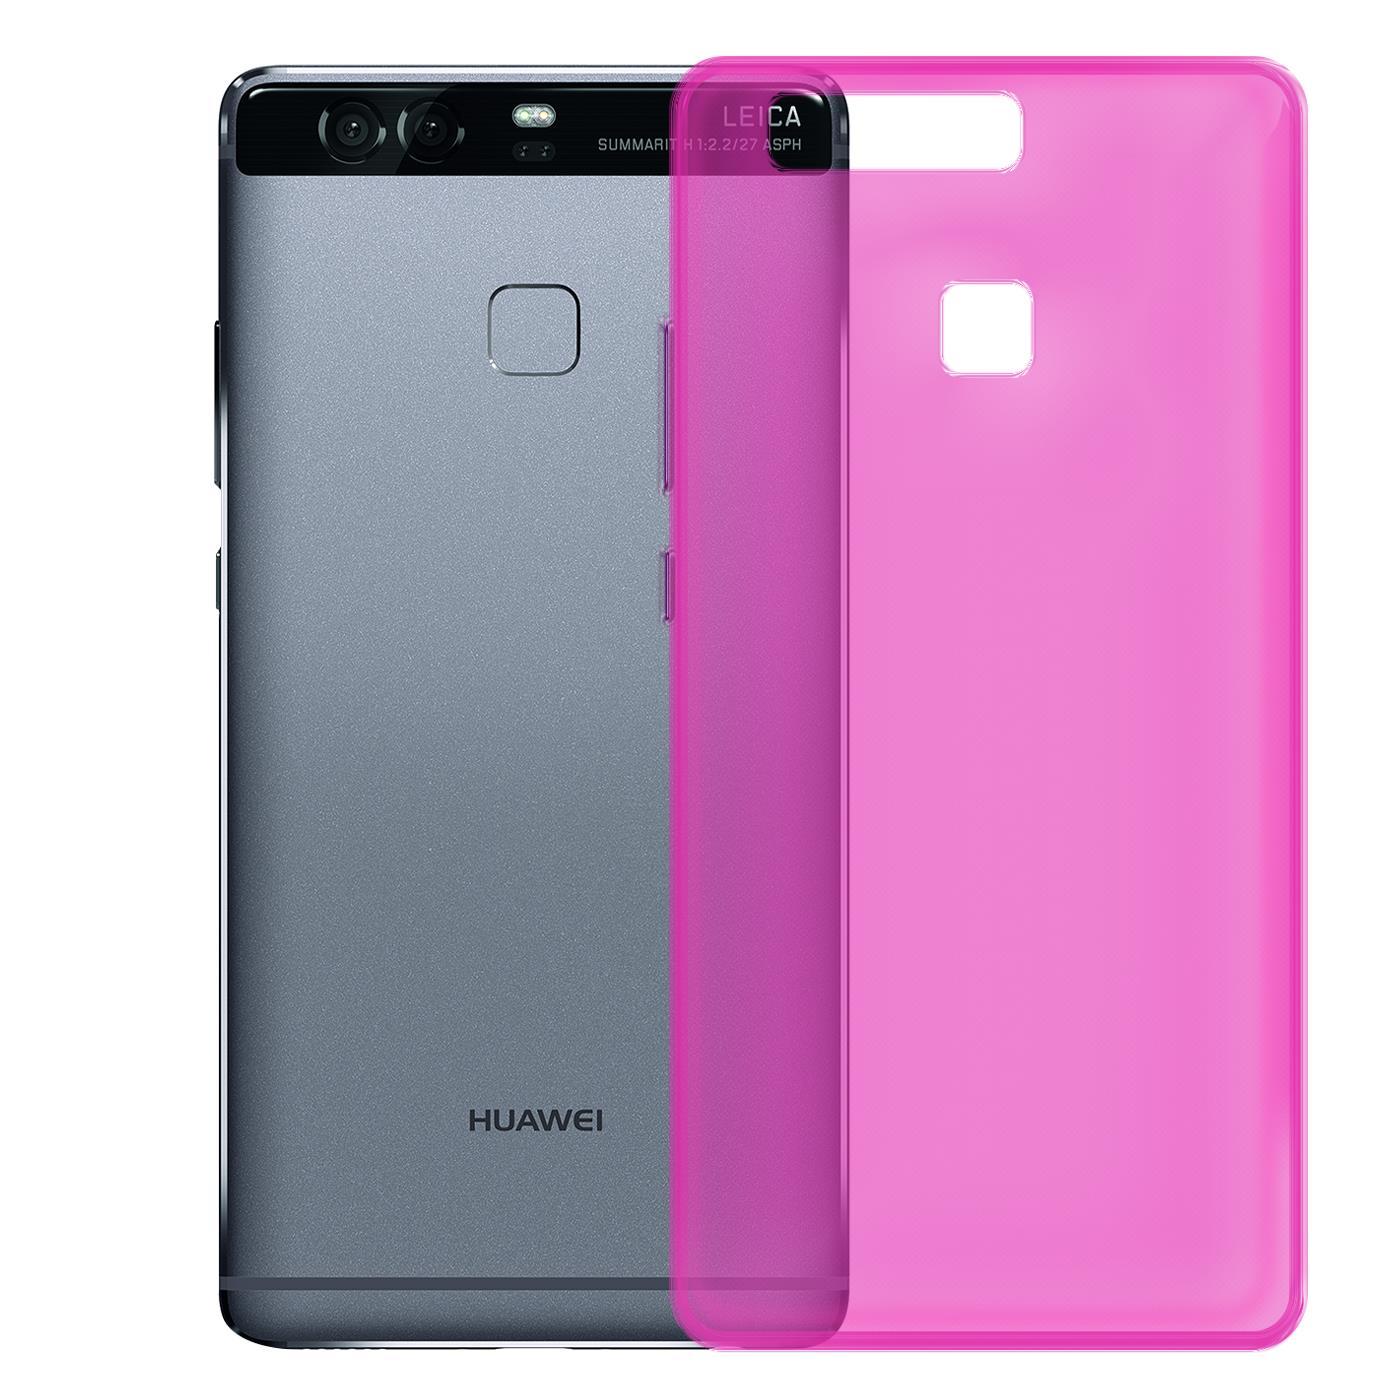 Huawei-p9-Duenn-Silikon-Klar-Case-Cover-Ultra-Slim-Stossfeste-Gel-Rueckseite Indexbild 24